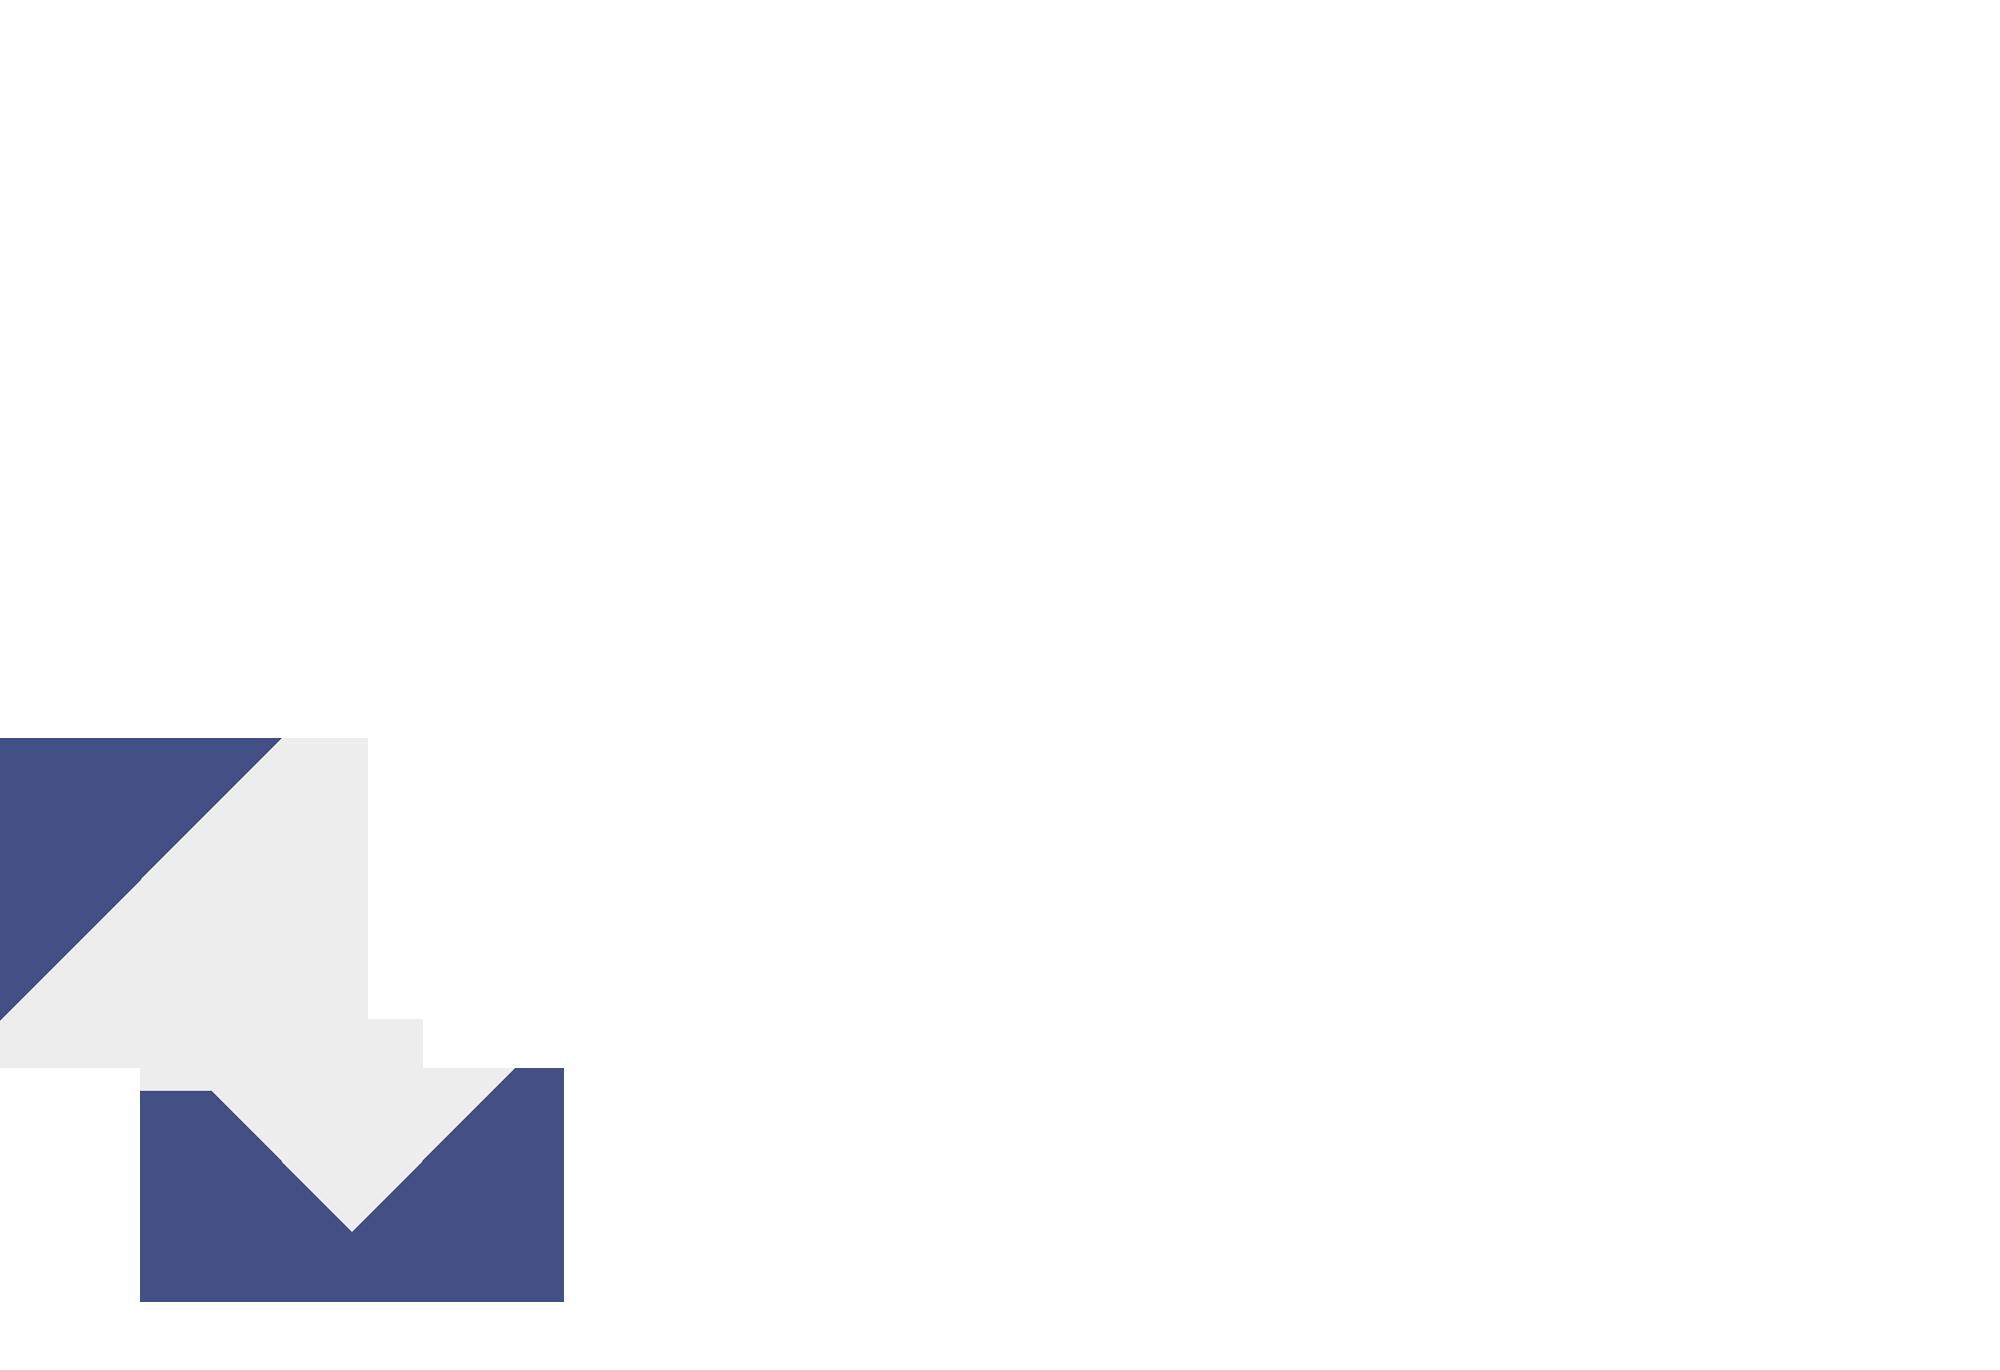 Brand Elite - What We Do - Block Box Design 5